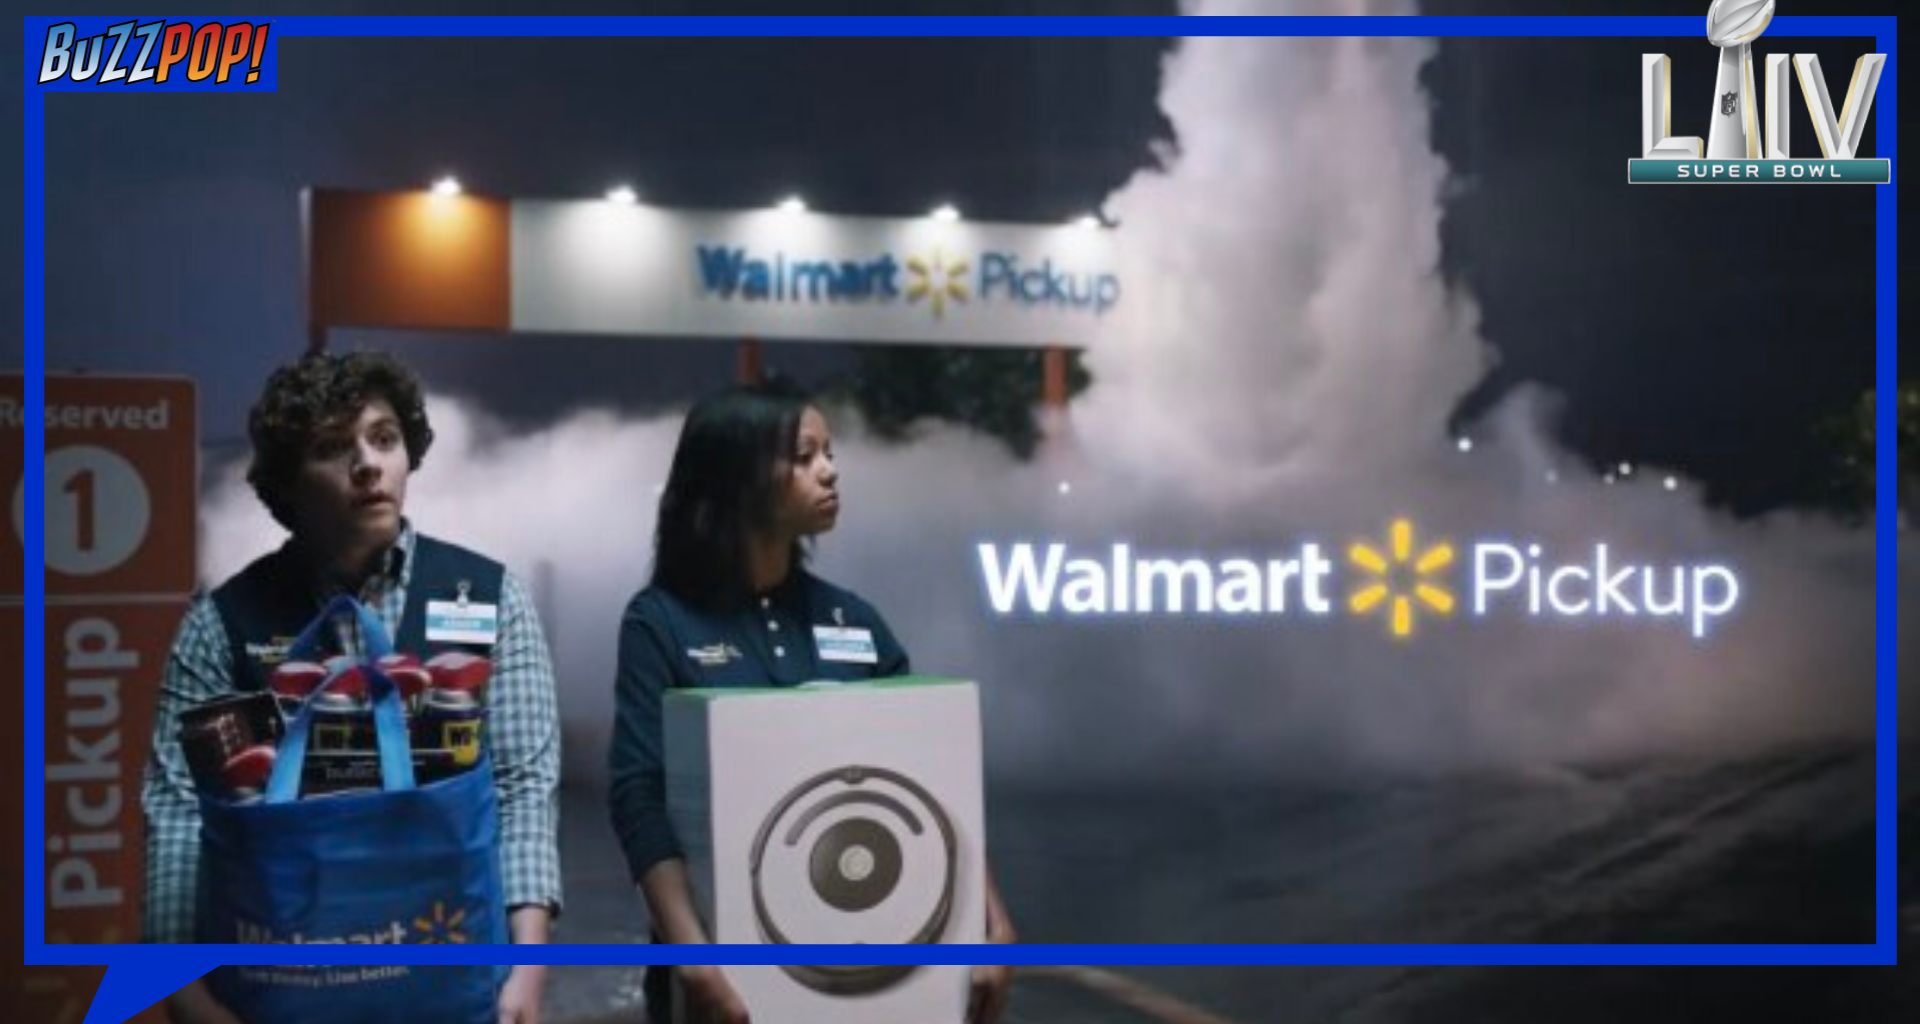 Super Bowl 2020 Walmart advertisement